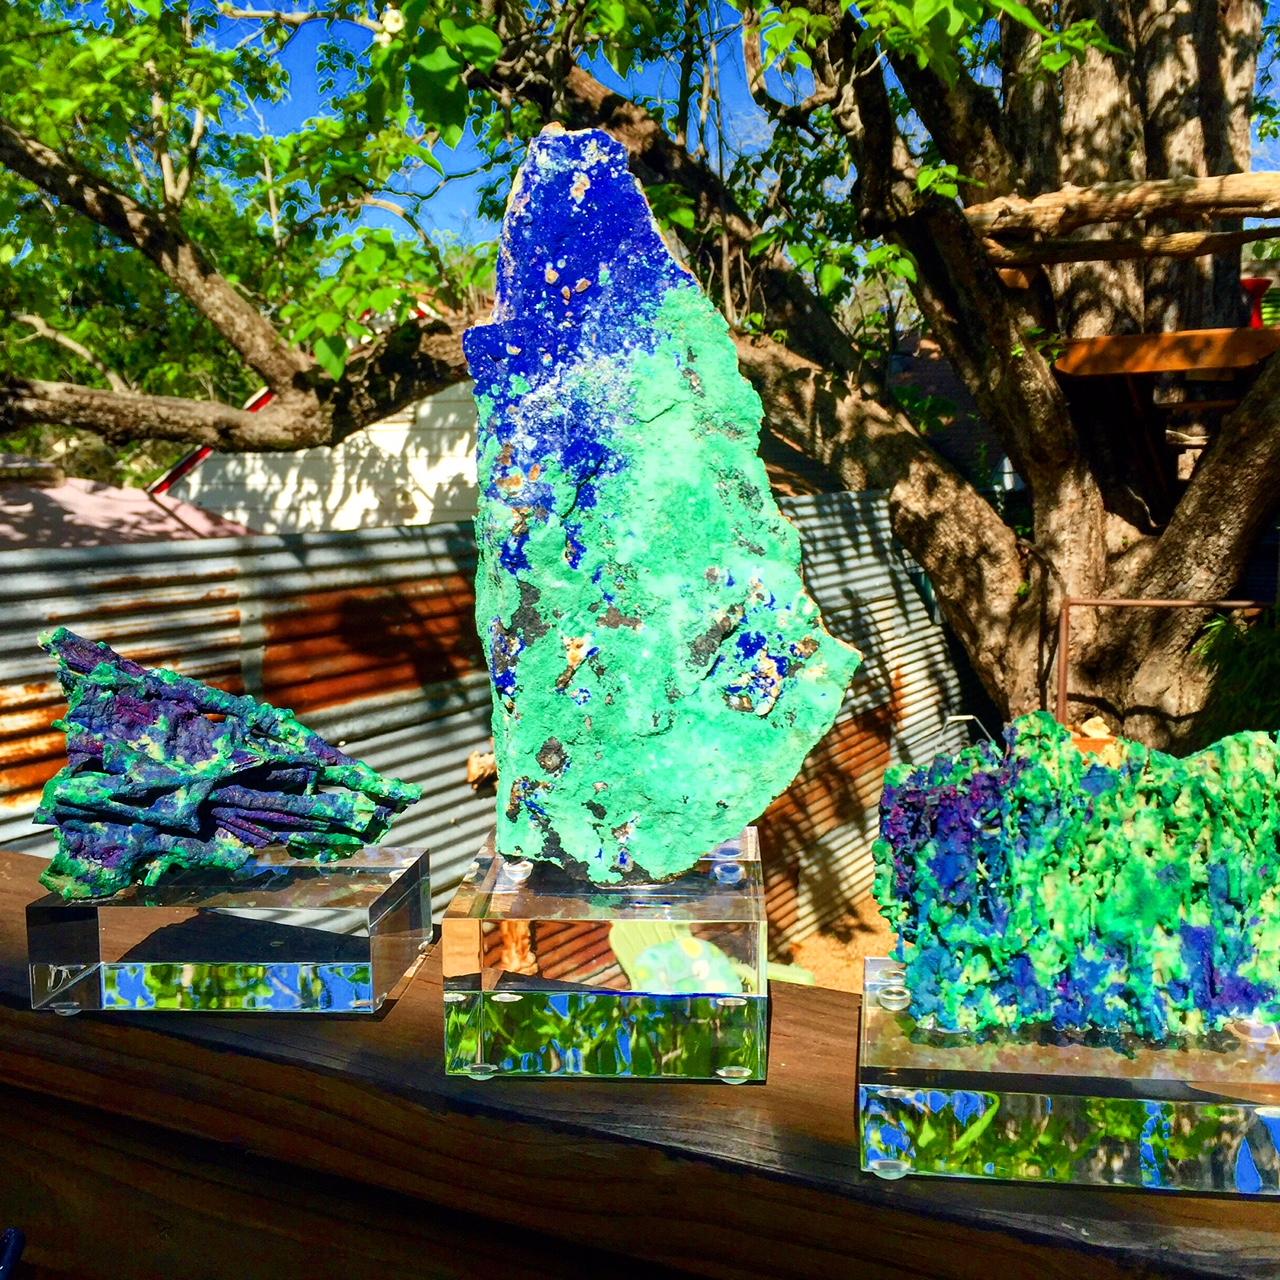 Decorative Malachite Azurite Sculptures IMG_4738.JPG